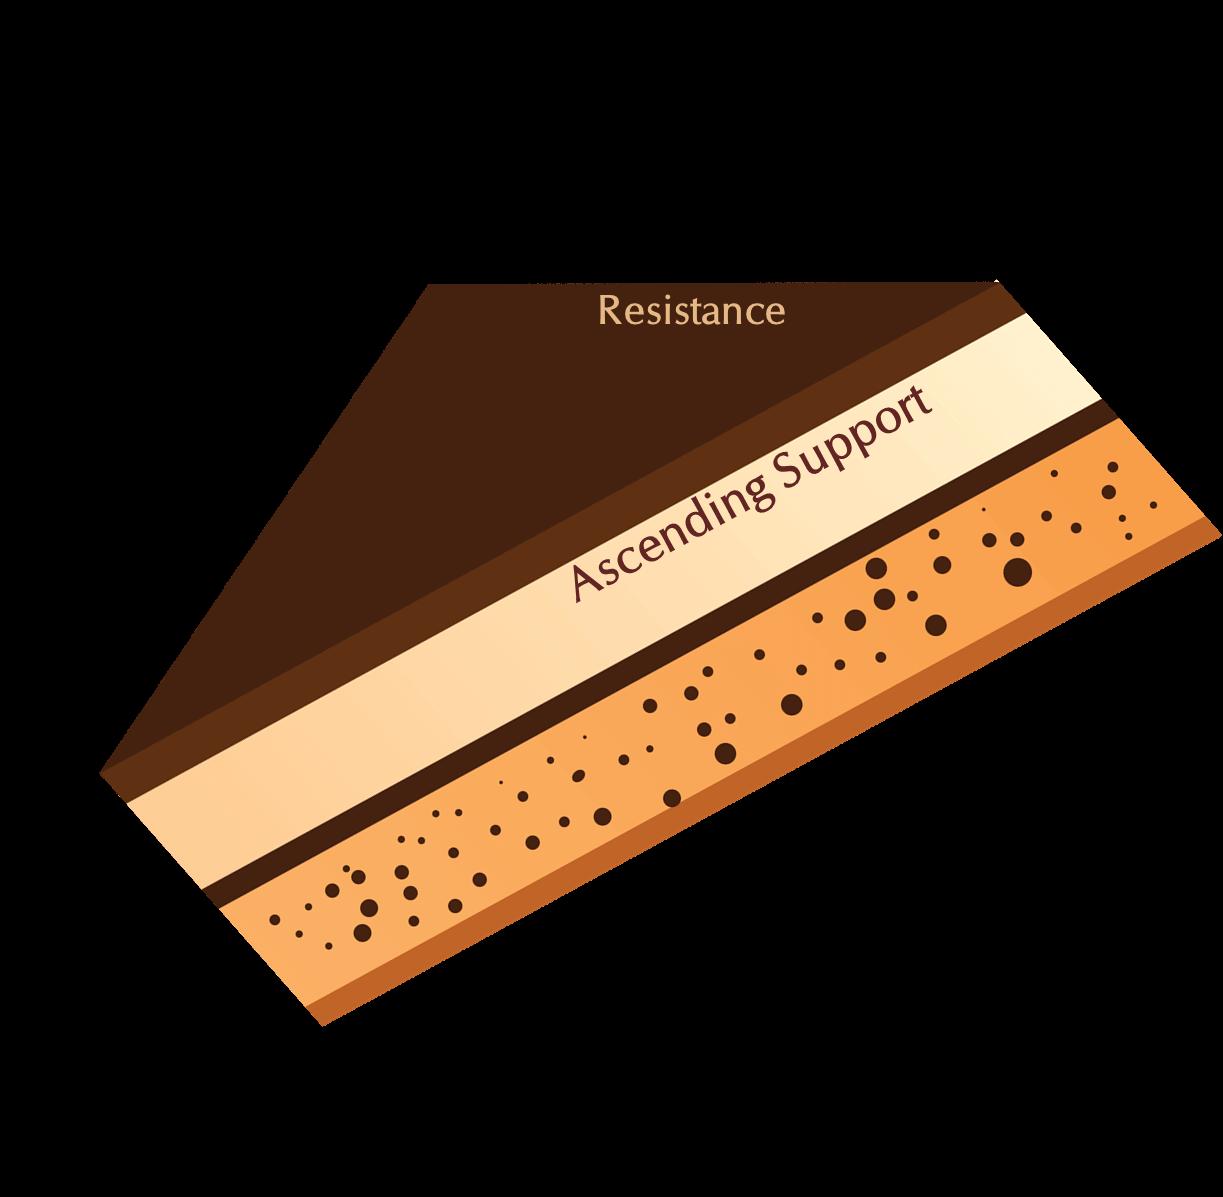 Ascending Triangle - Cake Metaphor